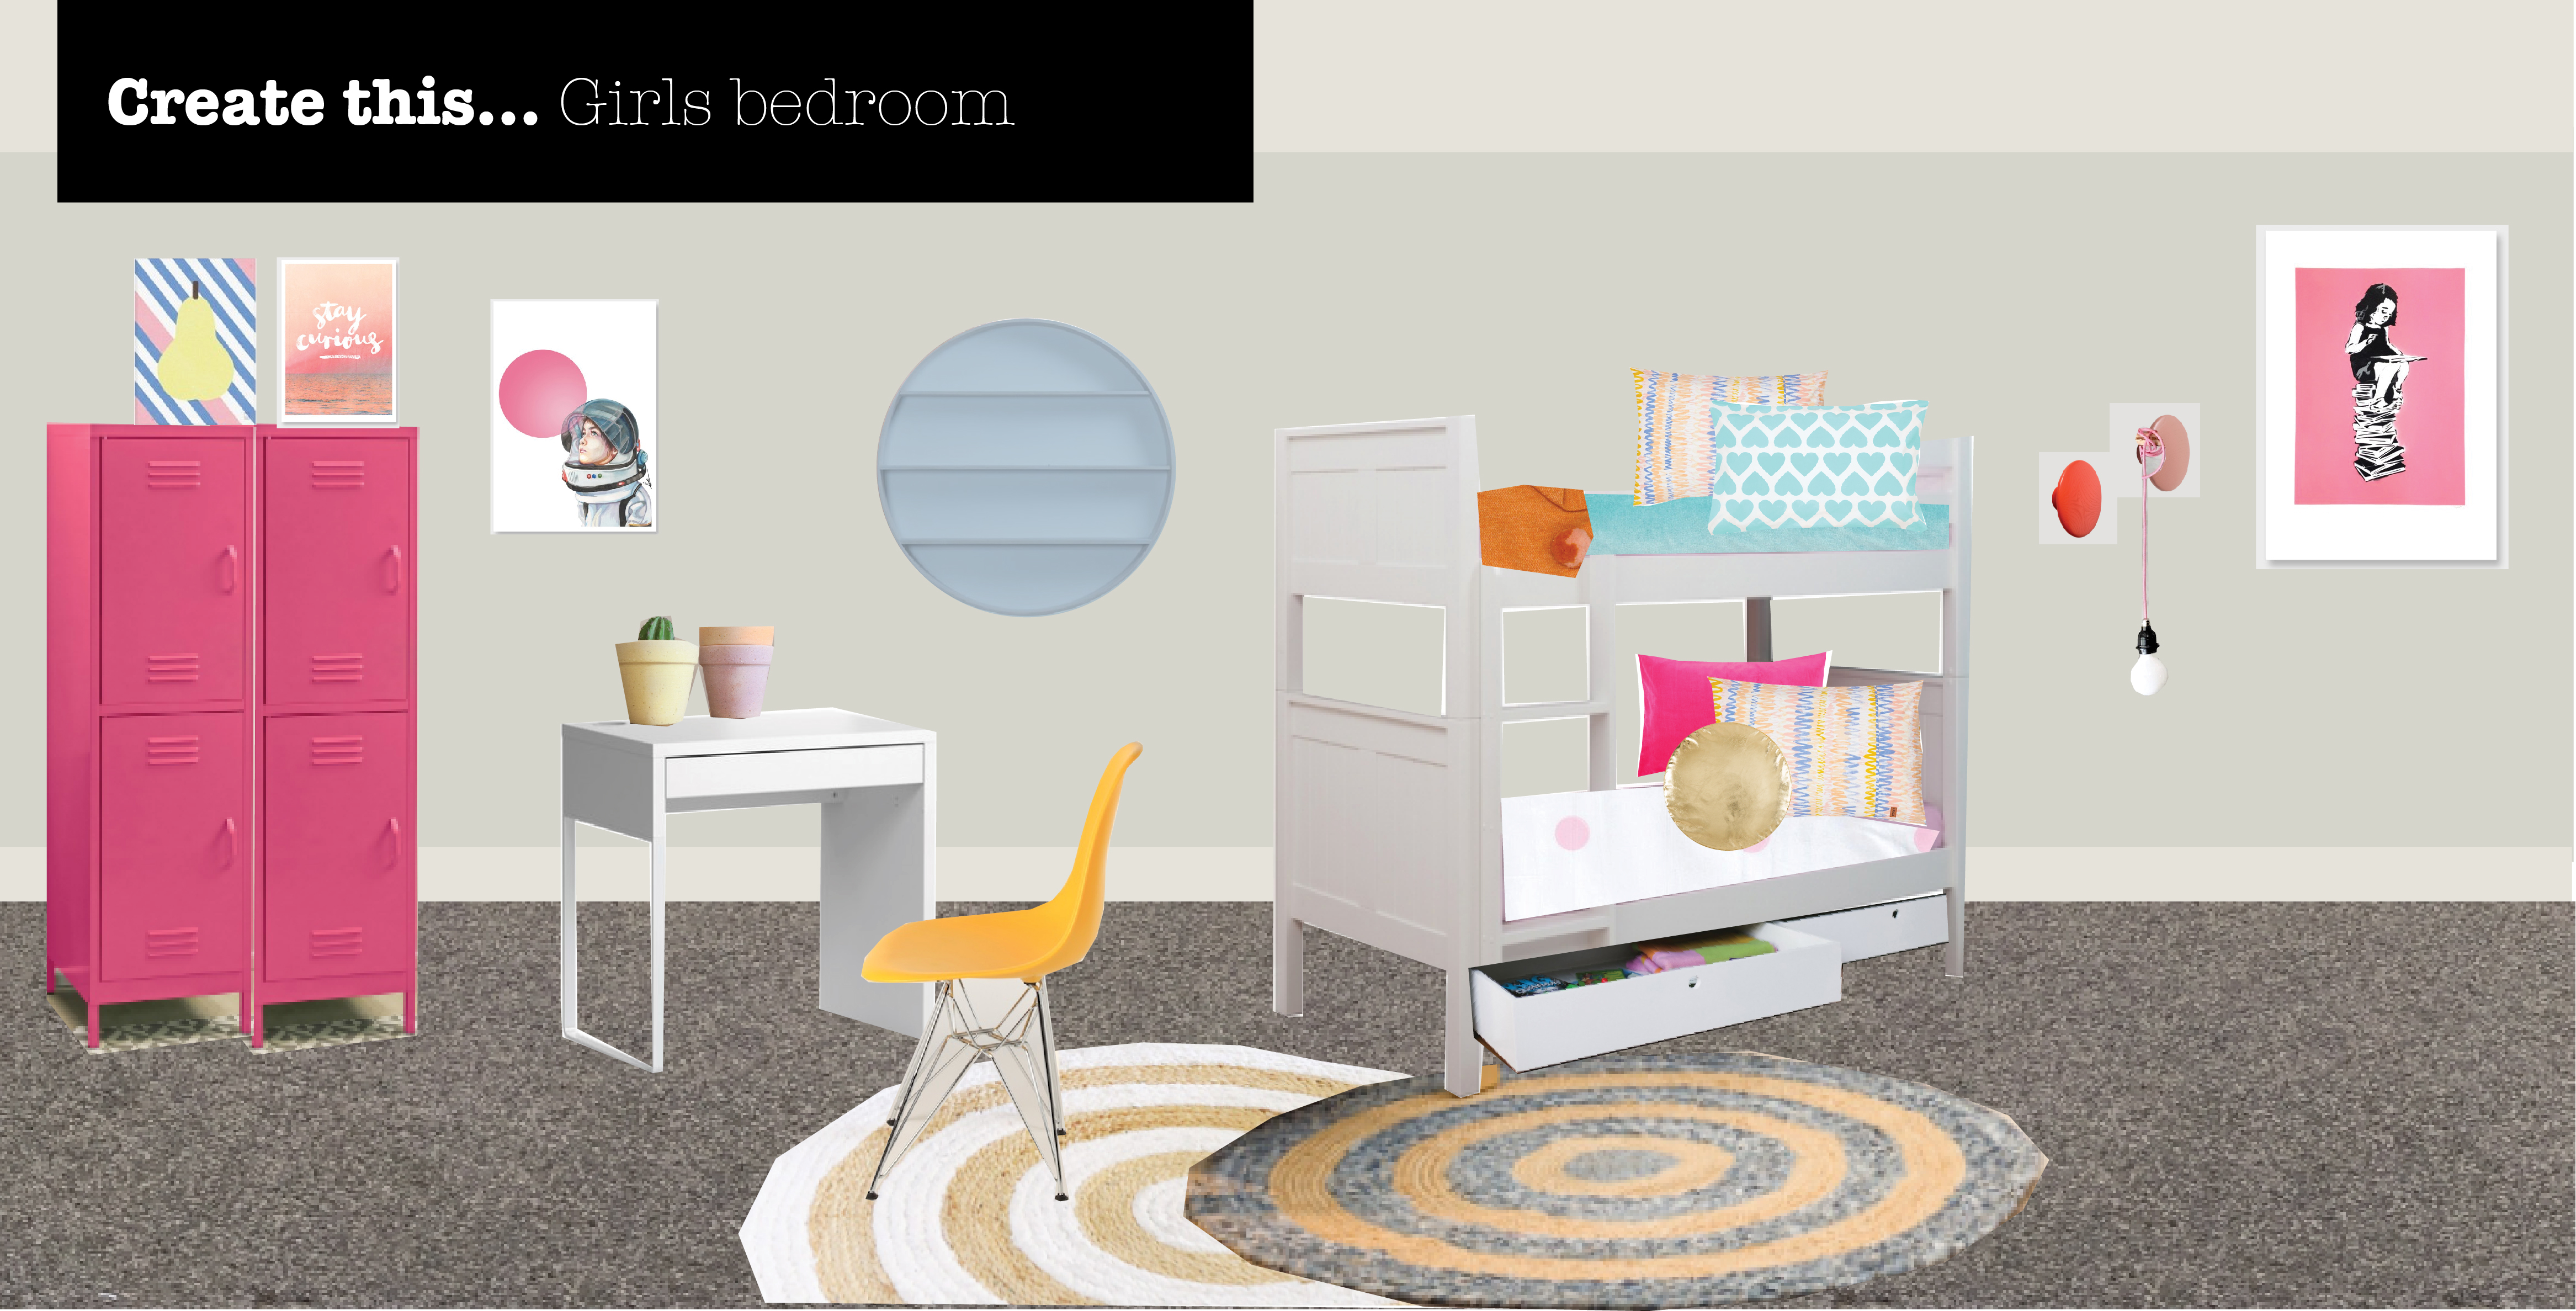 interior design for a girls bedroom